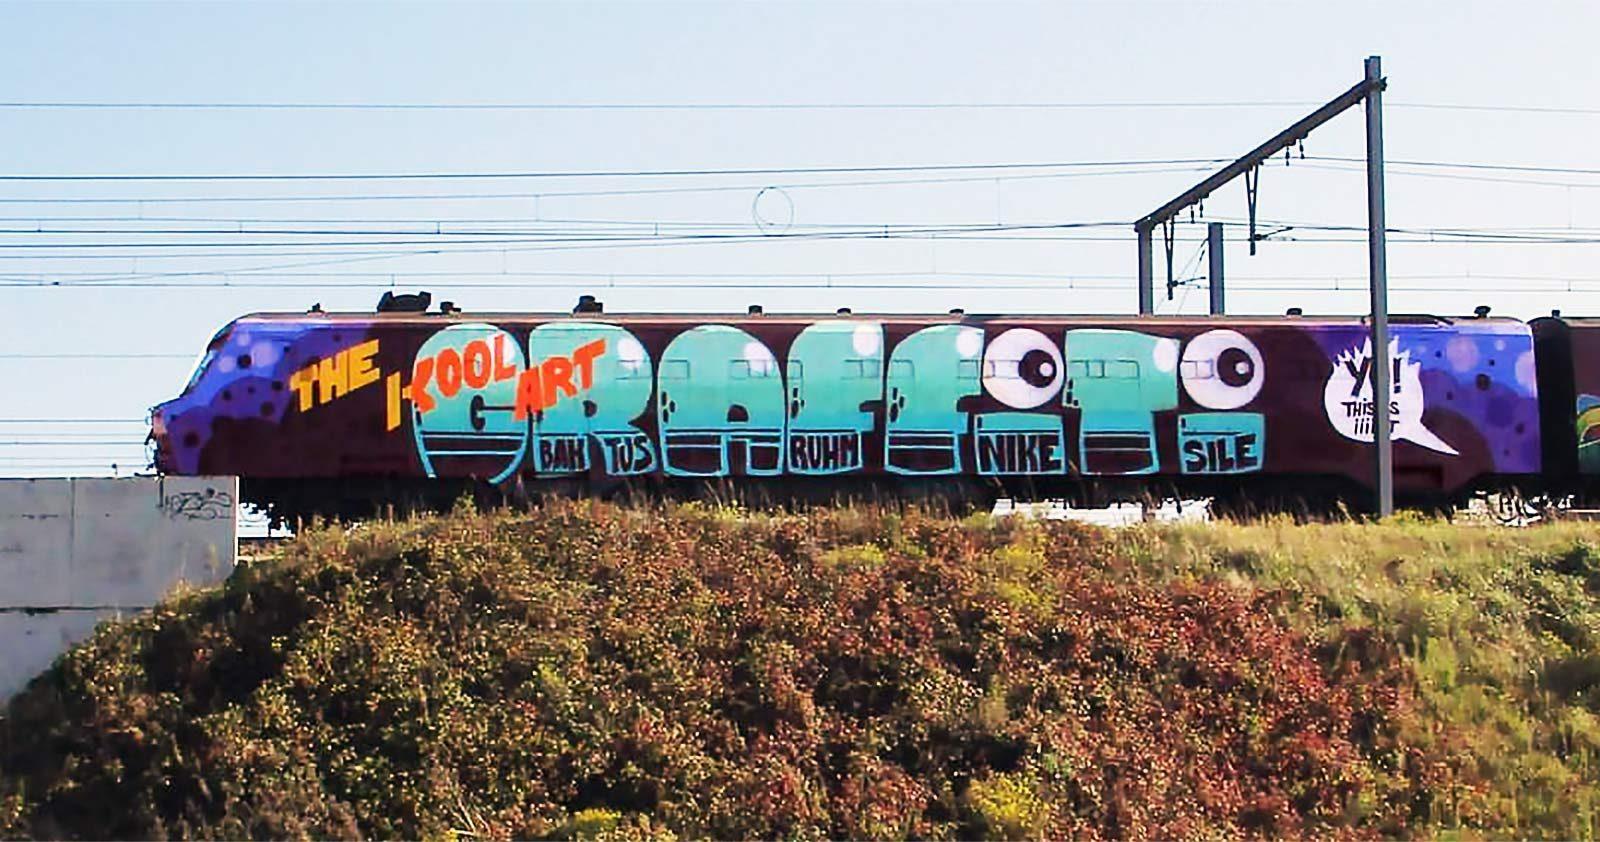 Graffiti can't be stopped!